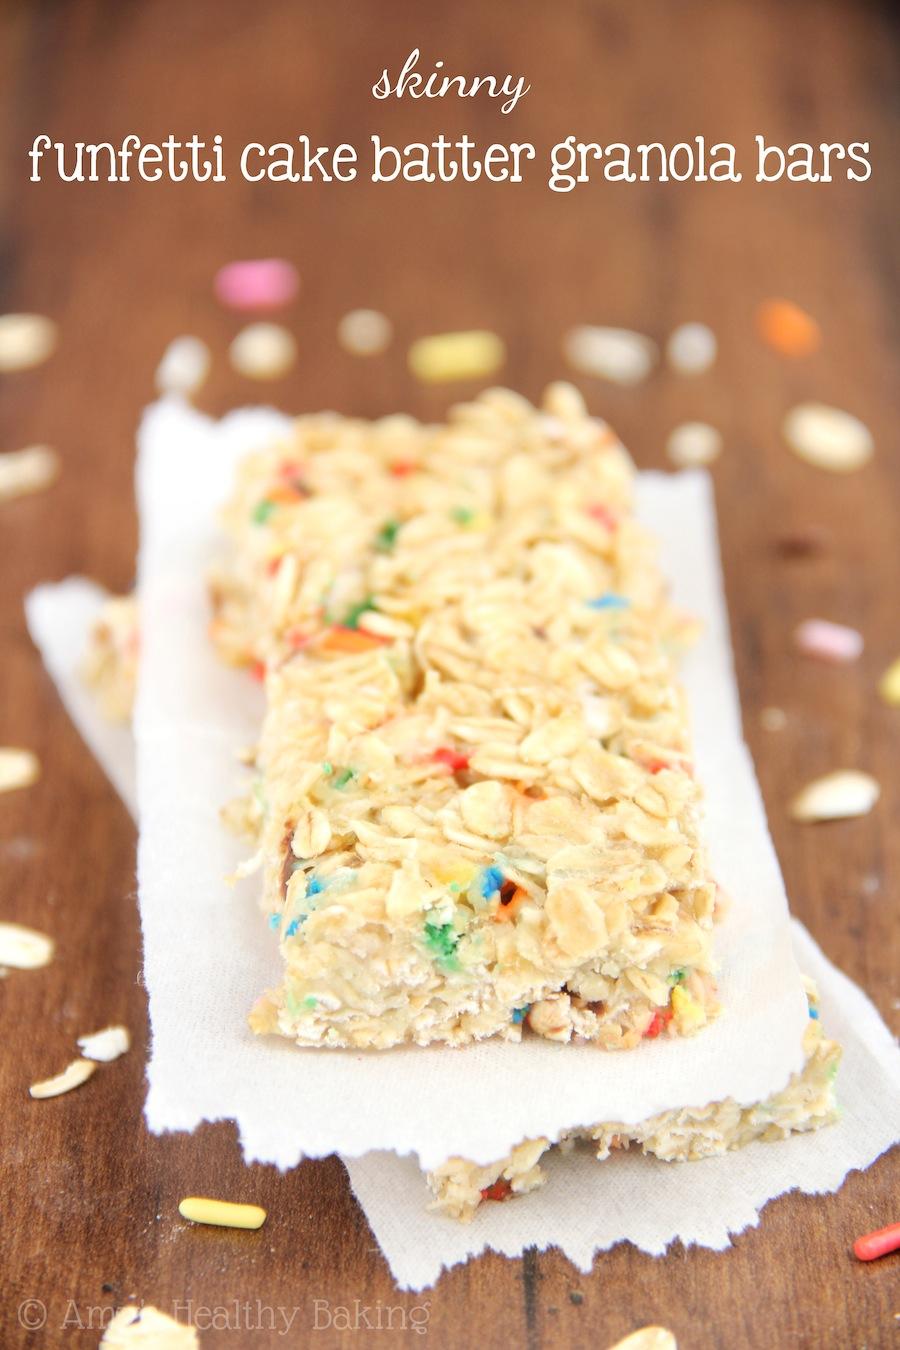 Skinny Funfetti Cake Batter Granola Bars -- super cute & low-calorie too!